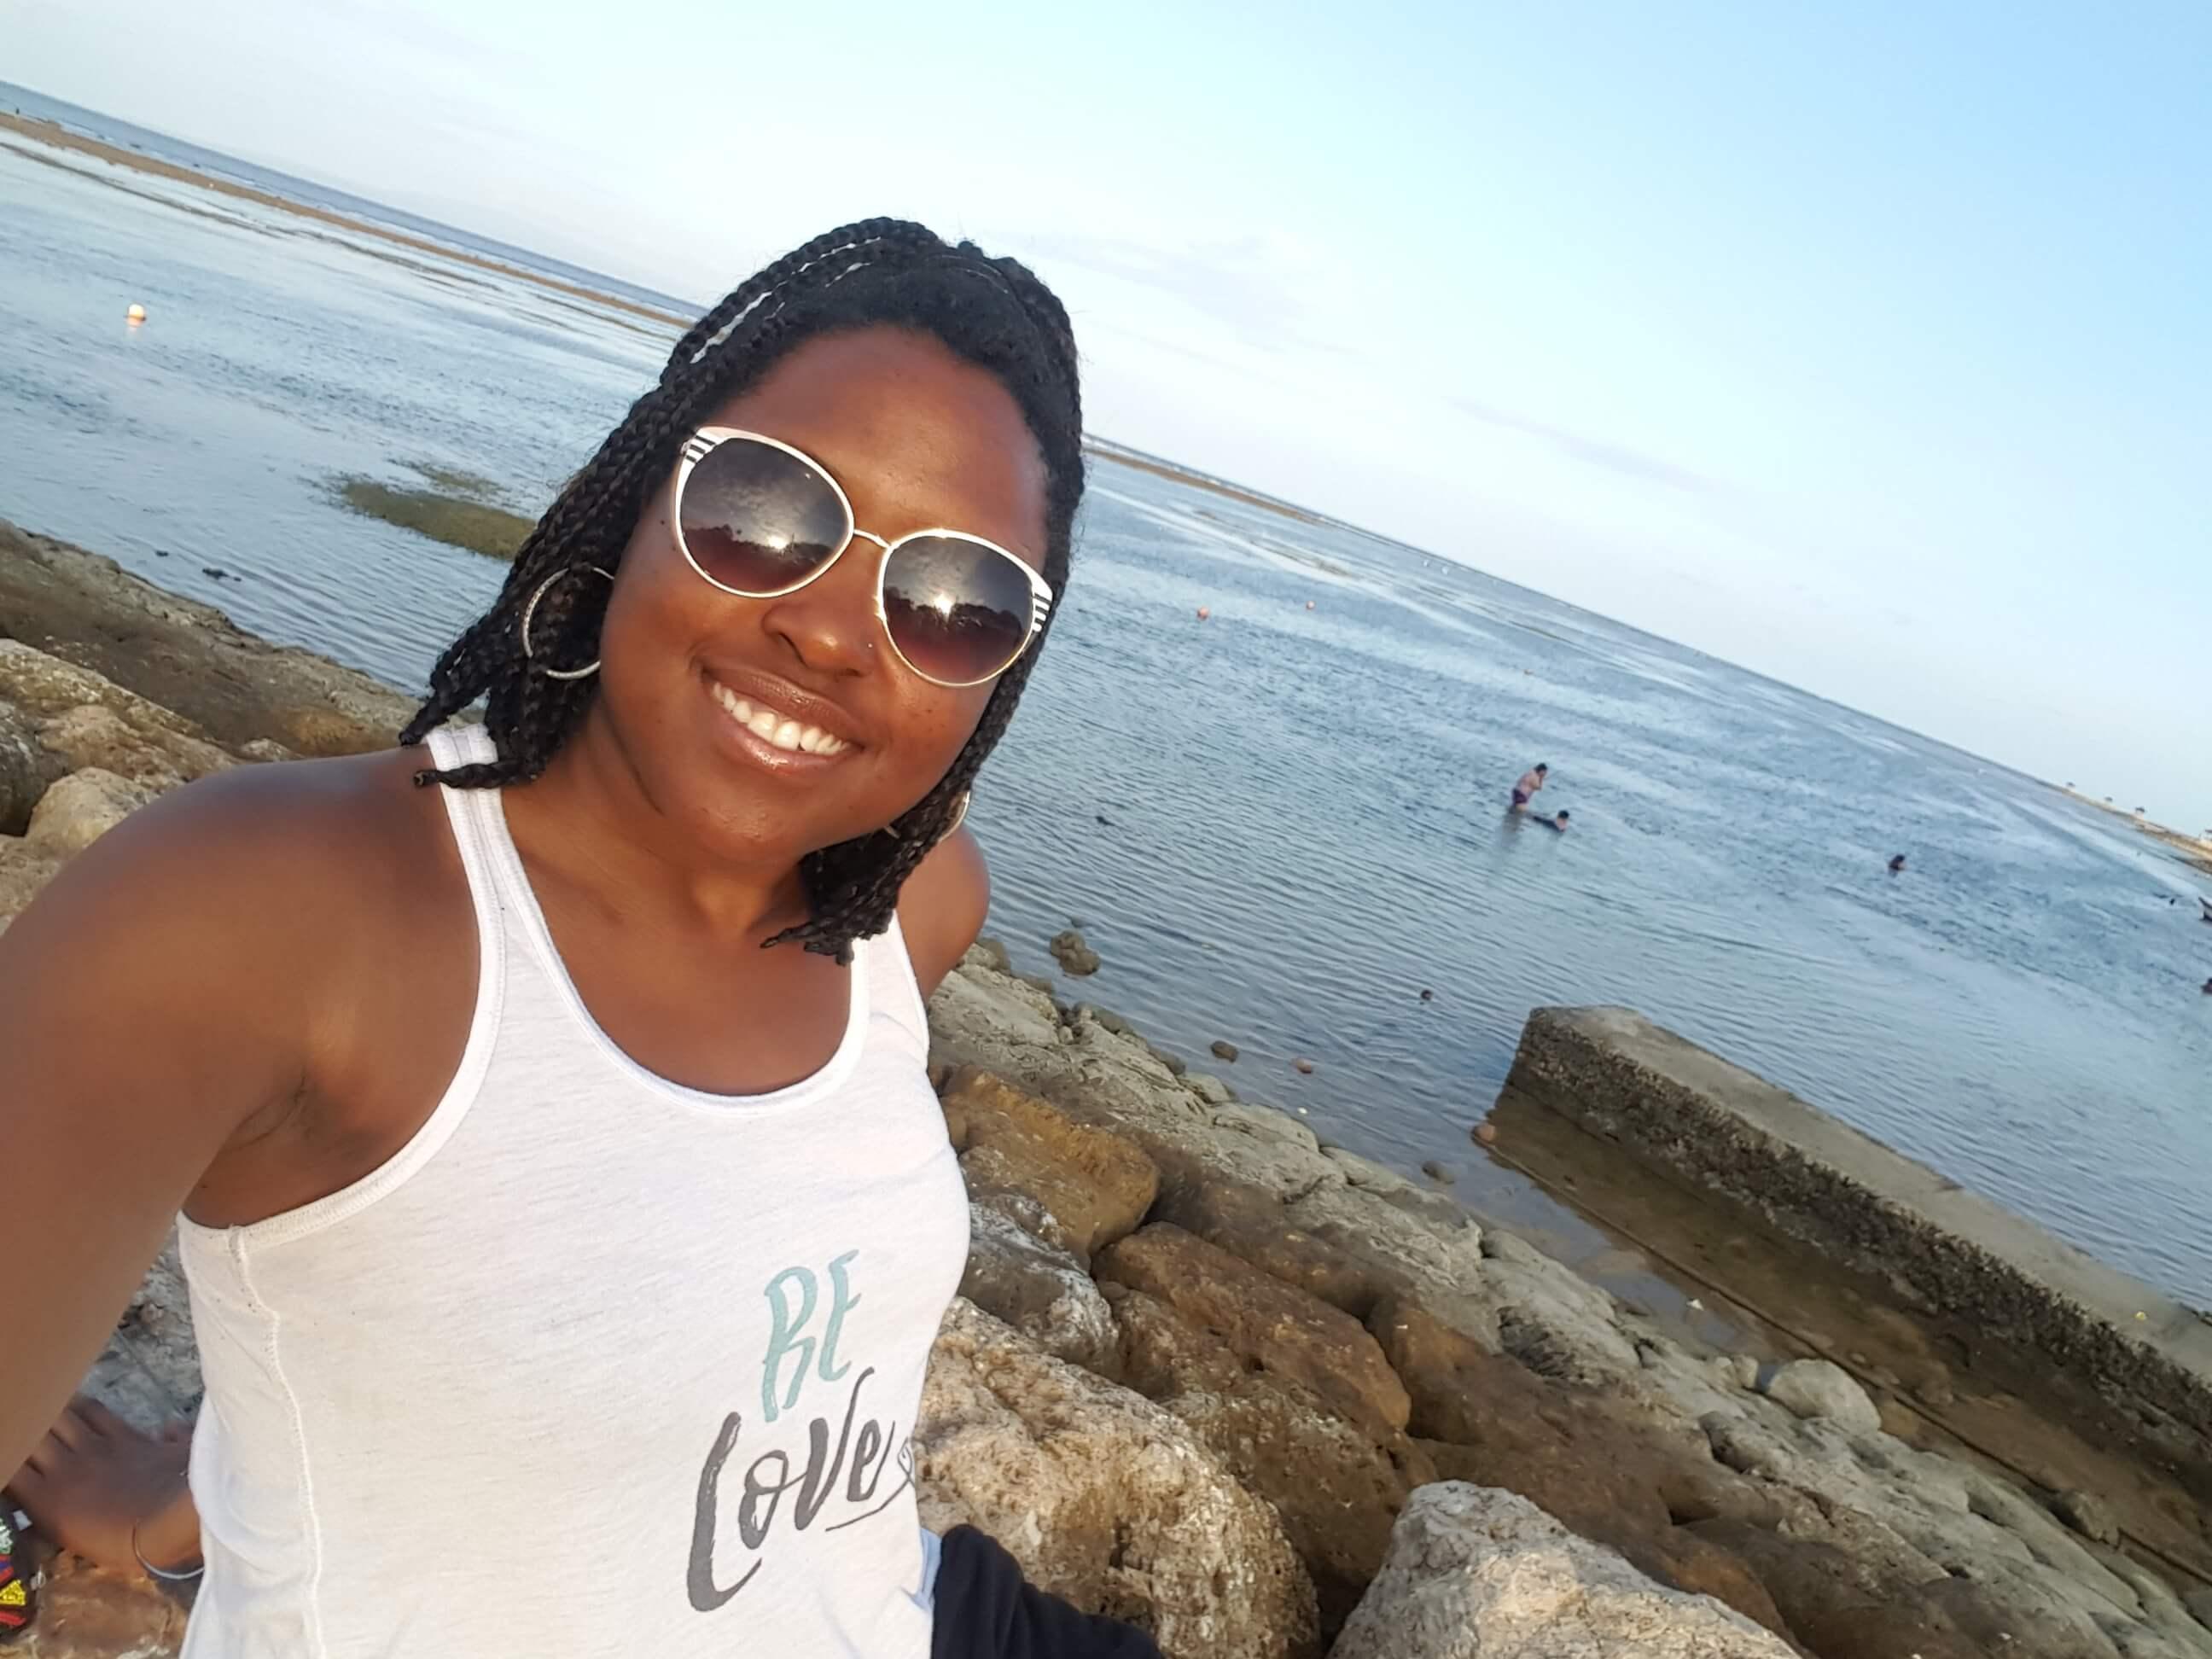 blog-Using-Travel-to-Promote-Self-Growth-sanur-bali